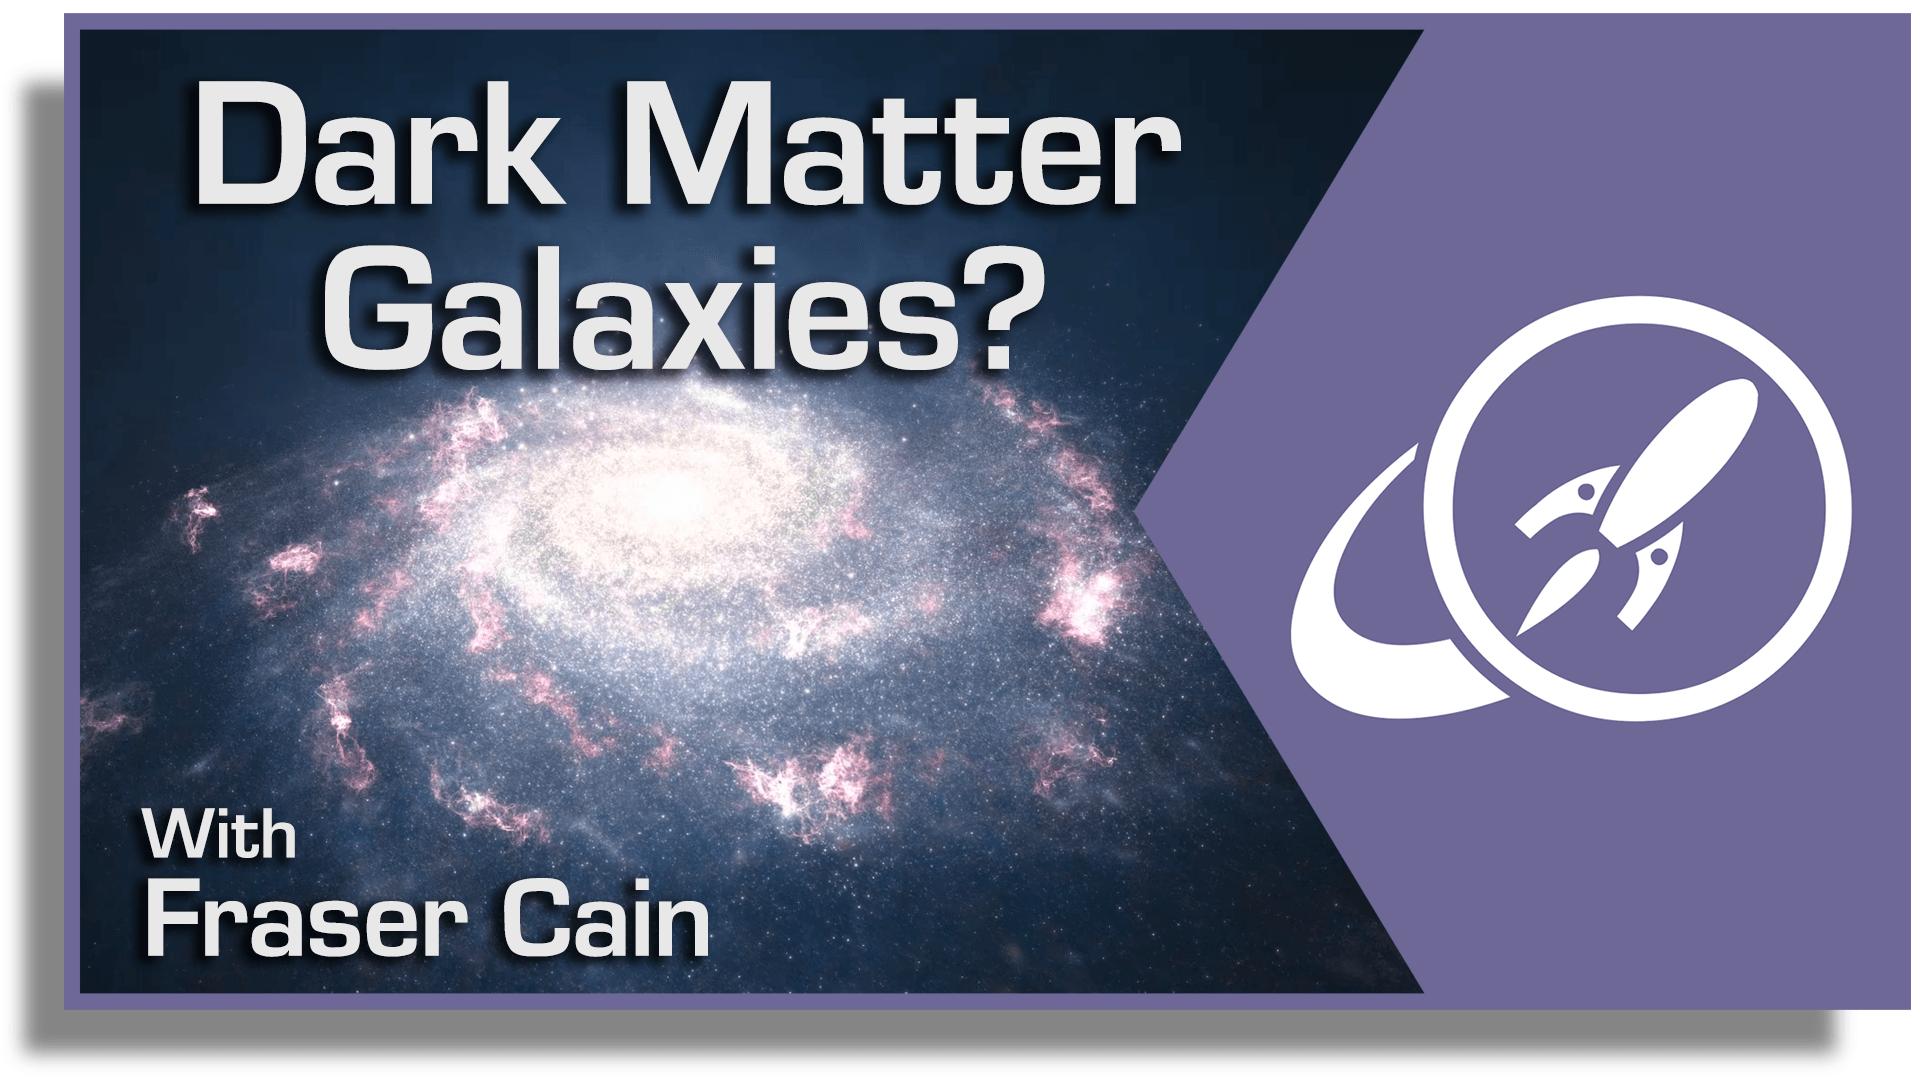 Dark Matter Galaxies?